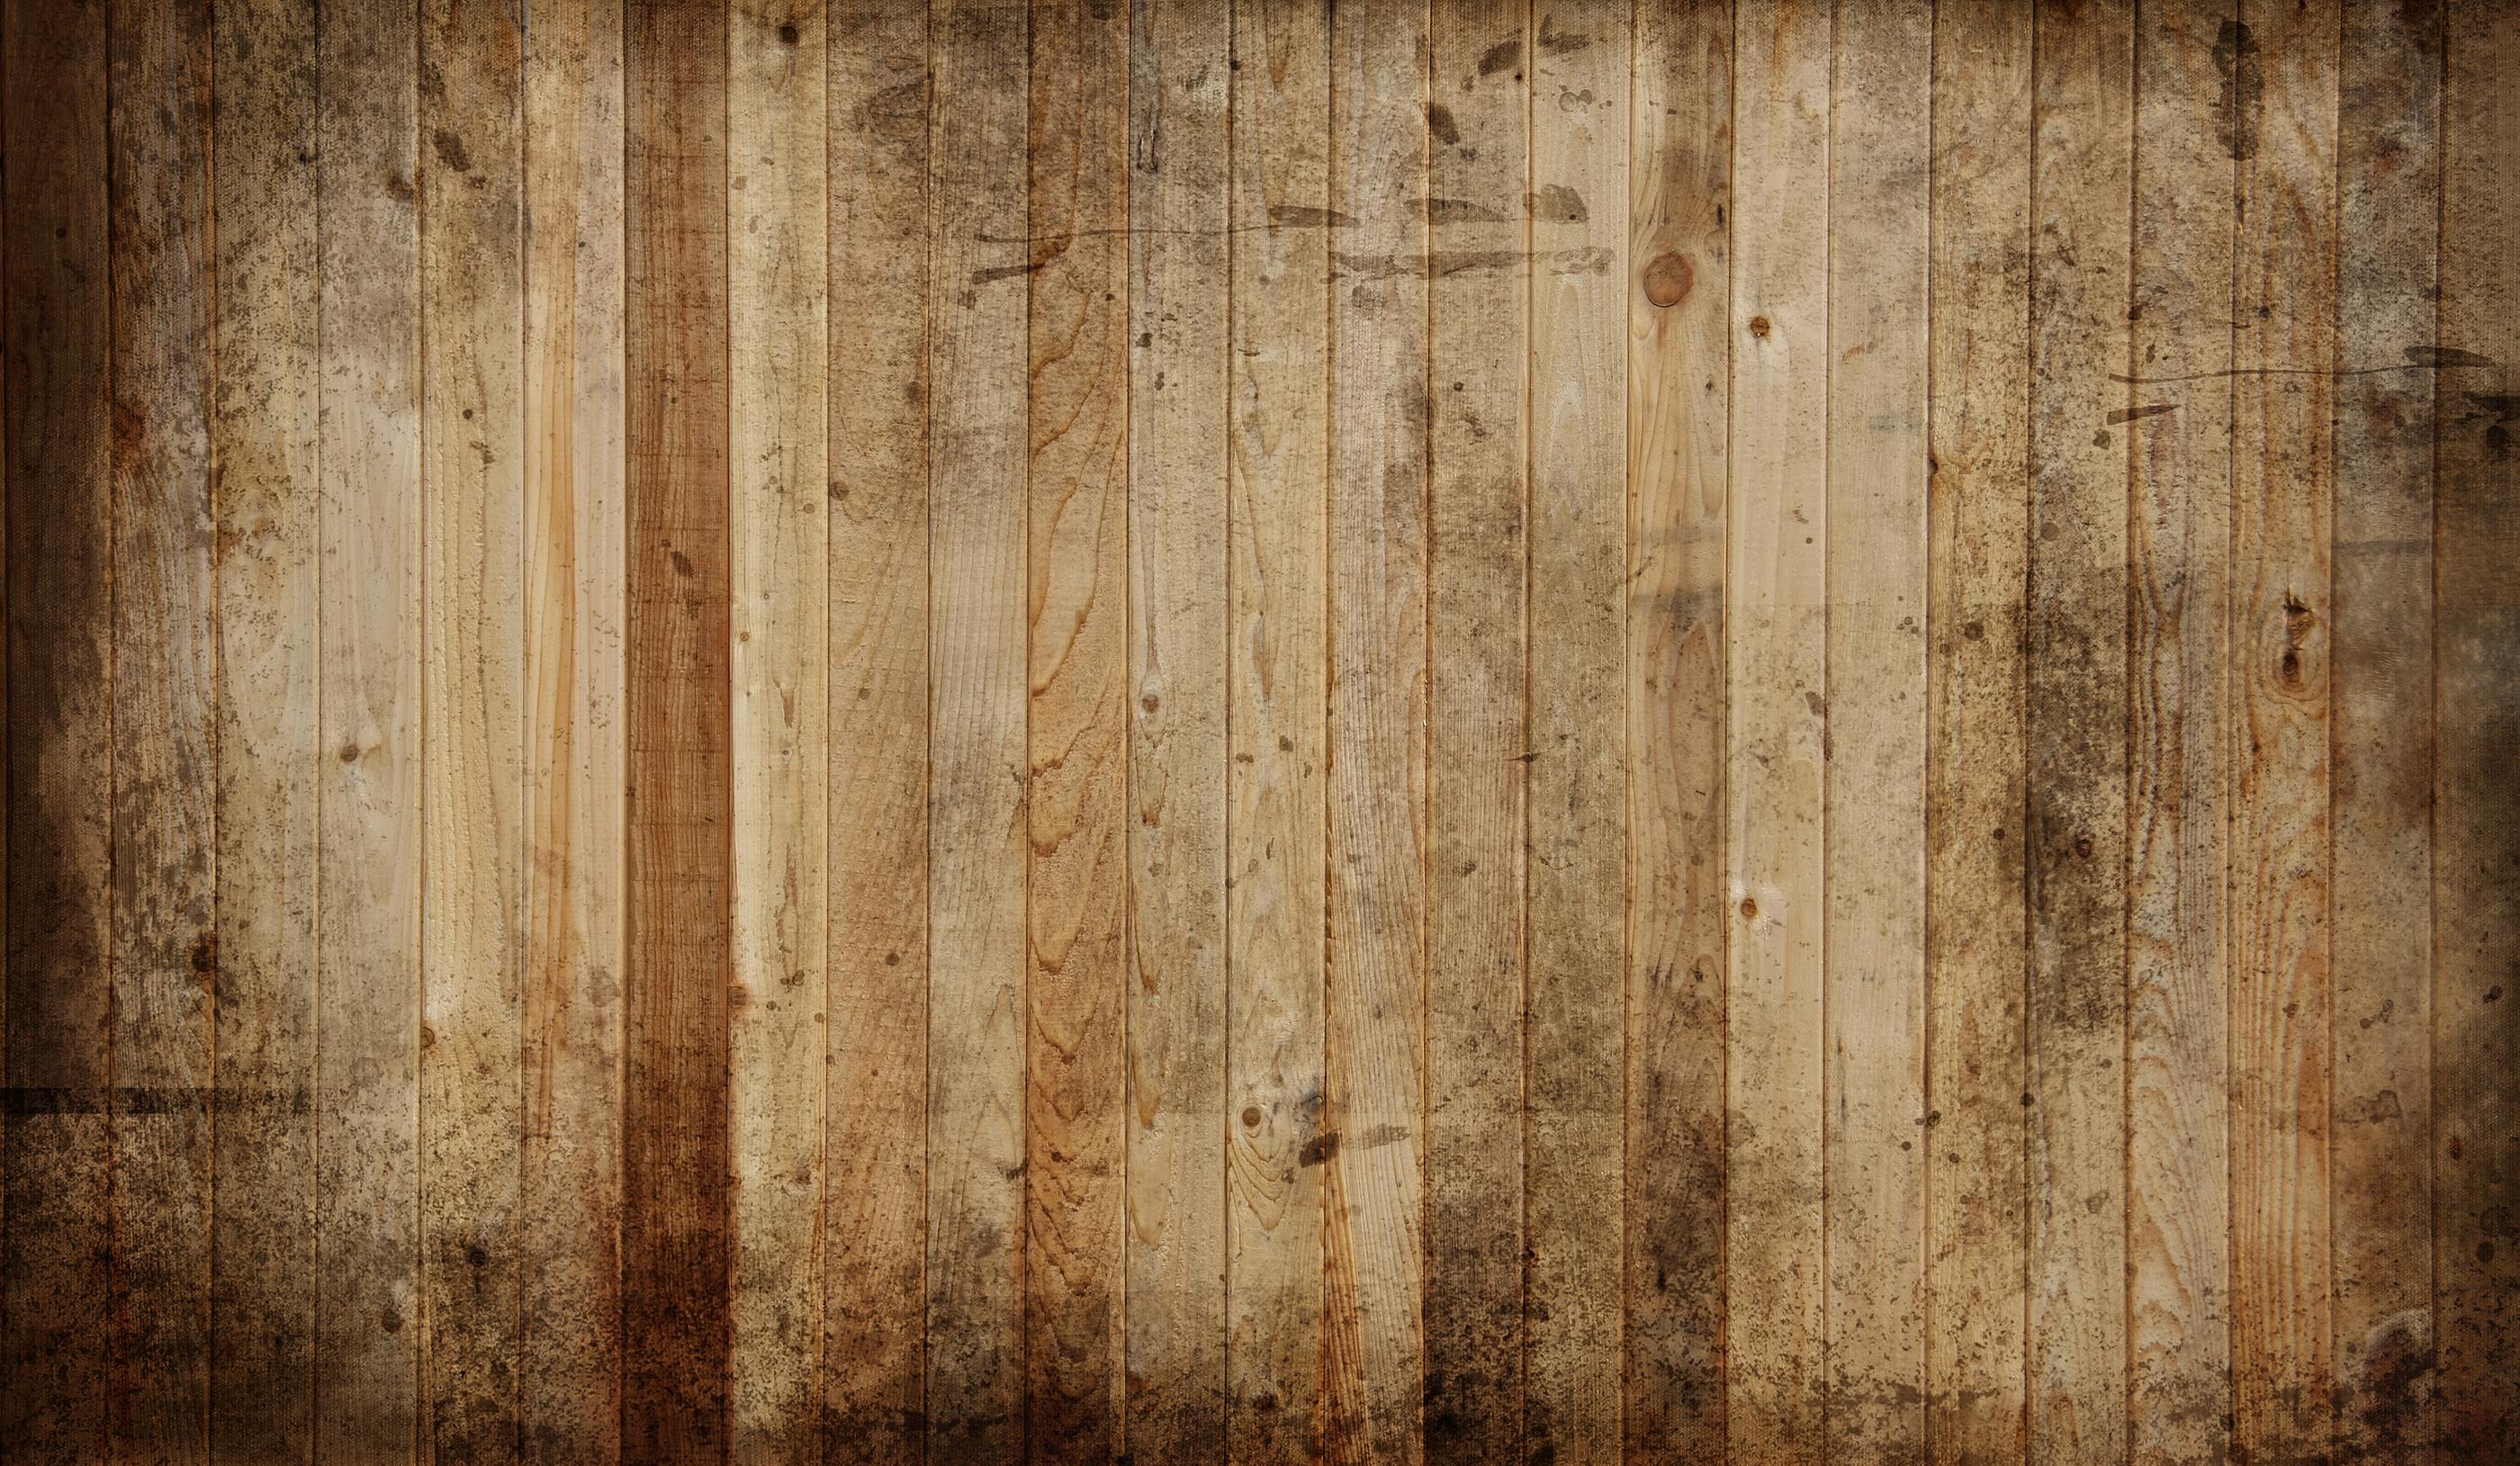 bigstock-Weathered-cedar-background-pan-15283265